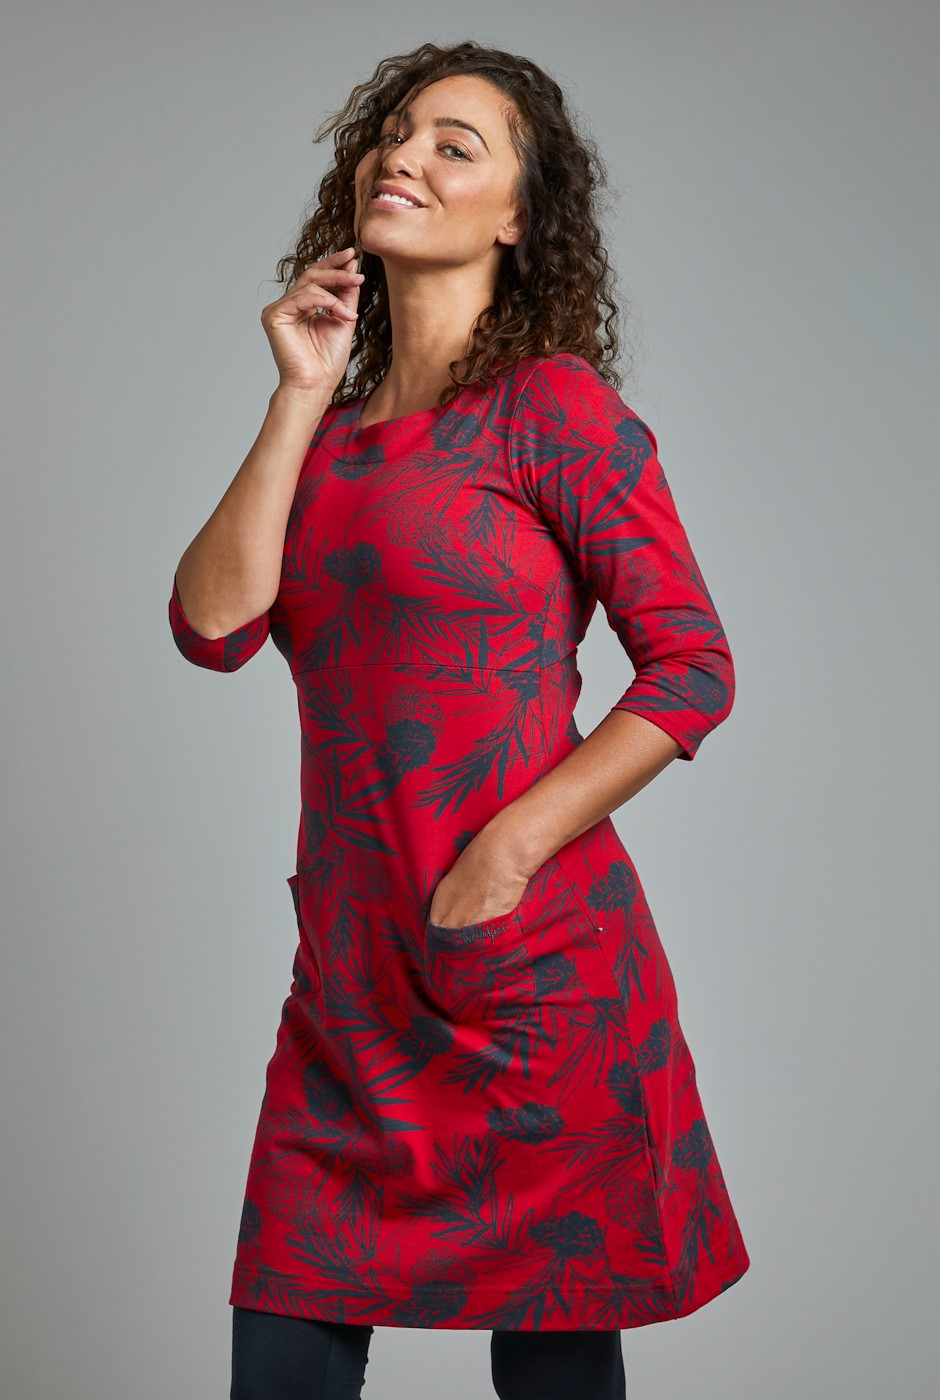 Starshine Organic Cotton Printed Jersey Dress Crimson